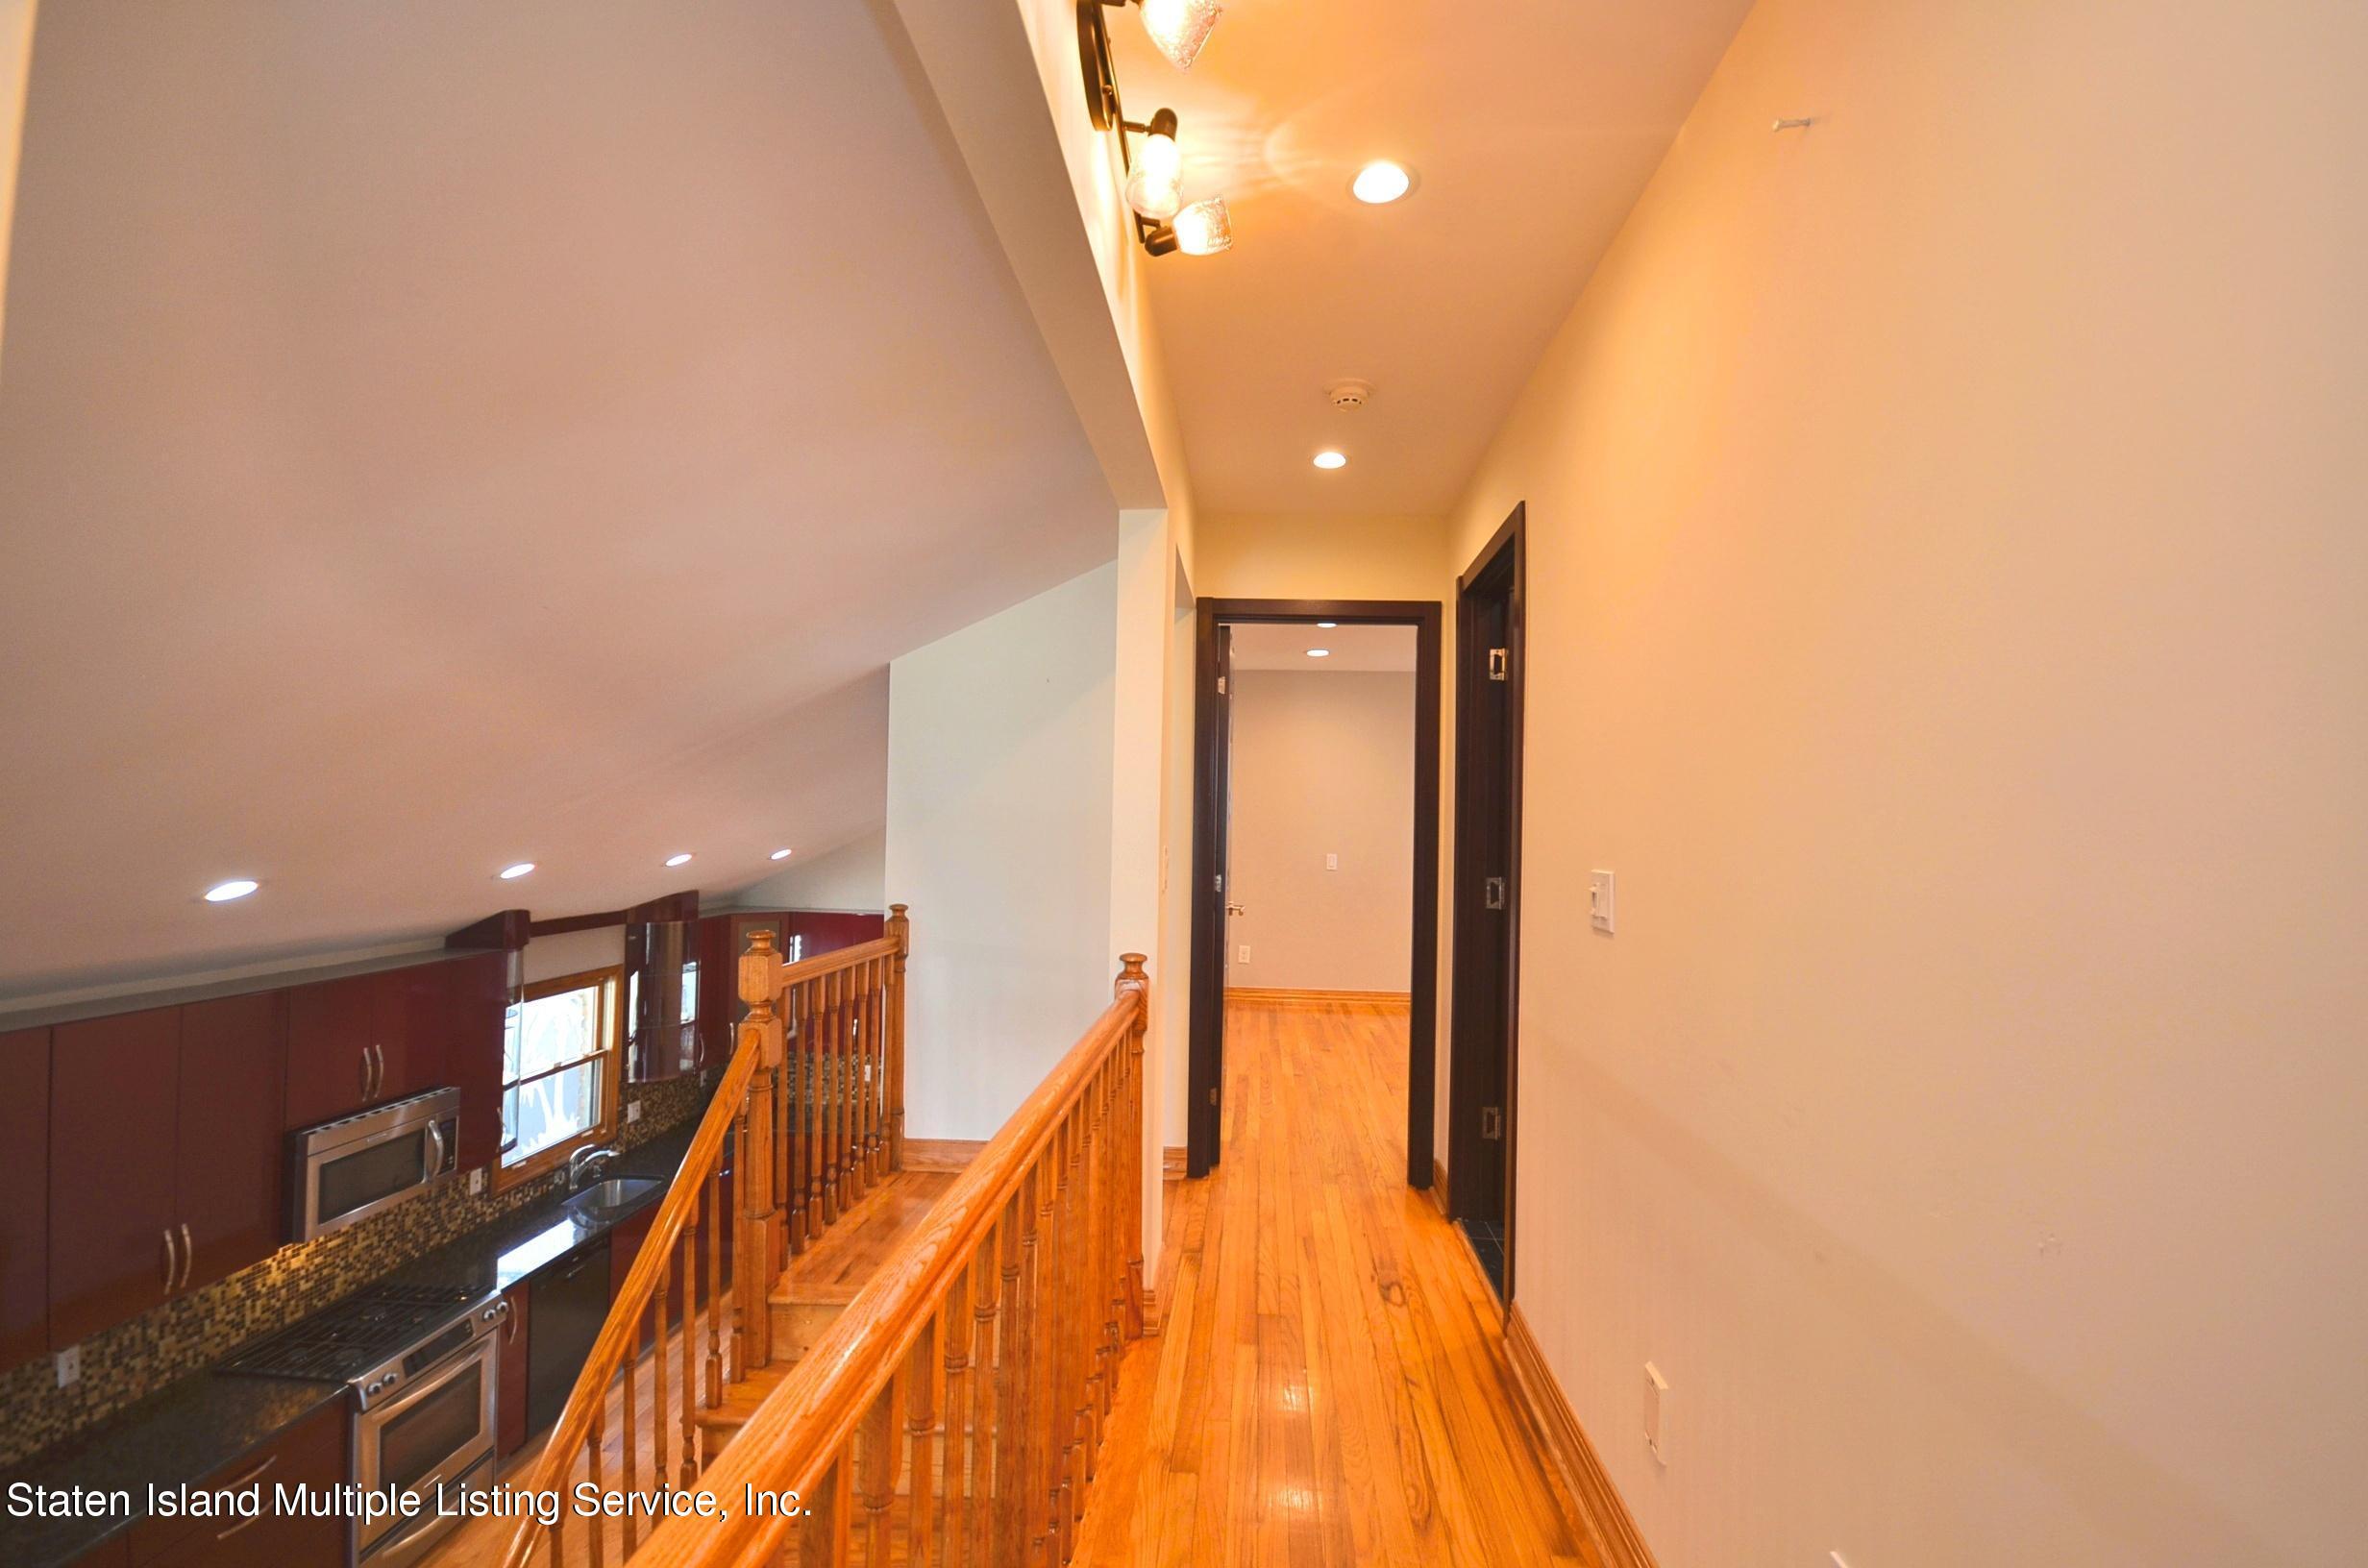 Single Family - Detached 48 Ocean Terrace  Staten Island, NY 10314, MLS-1142240-15